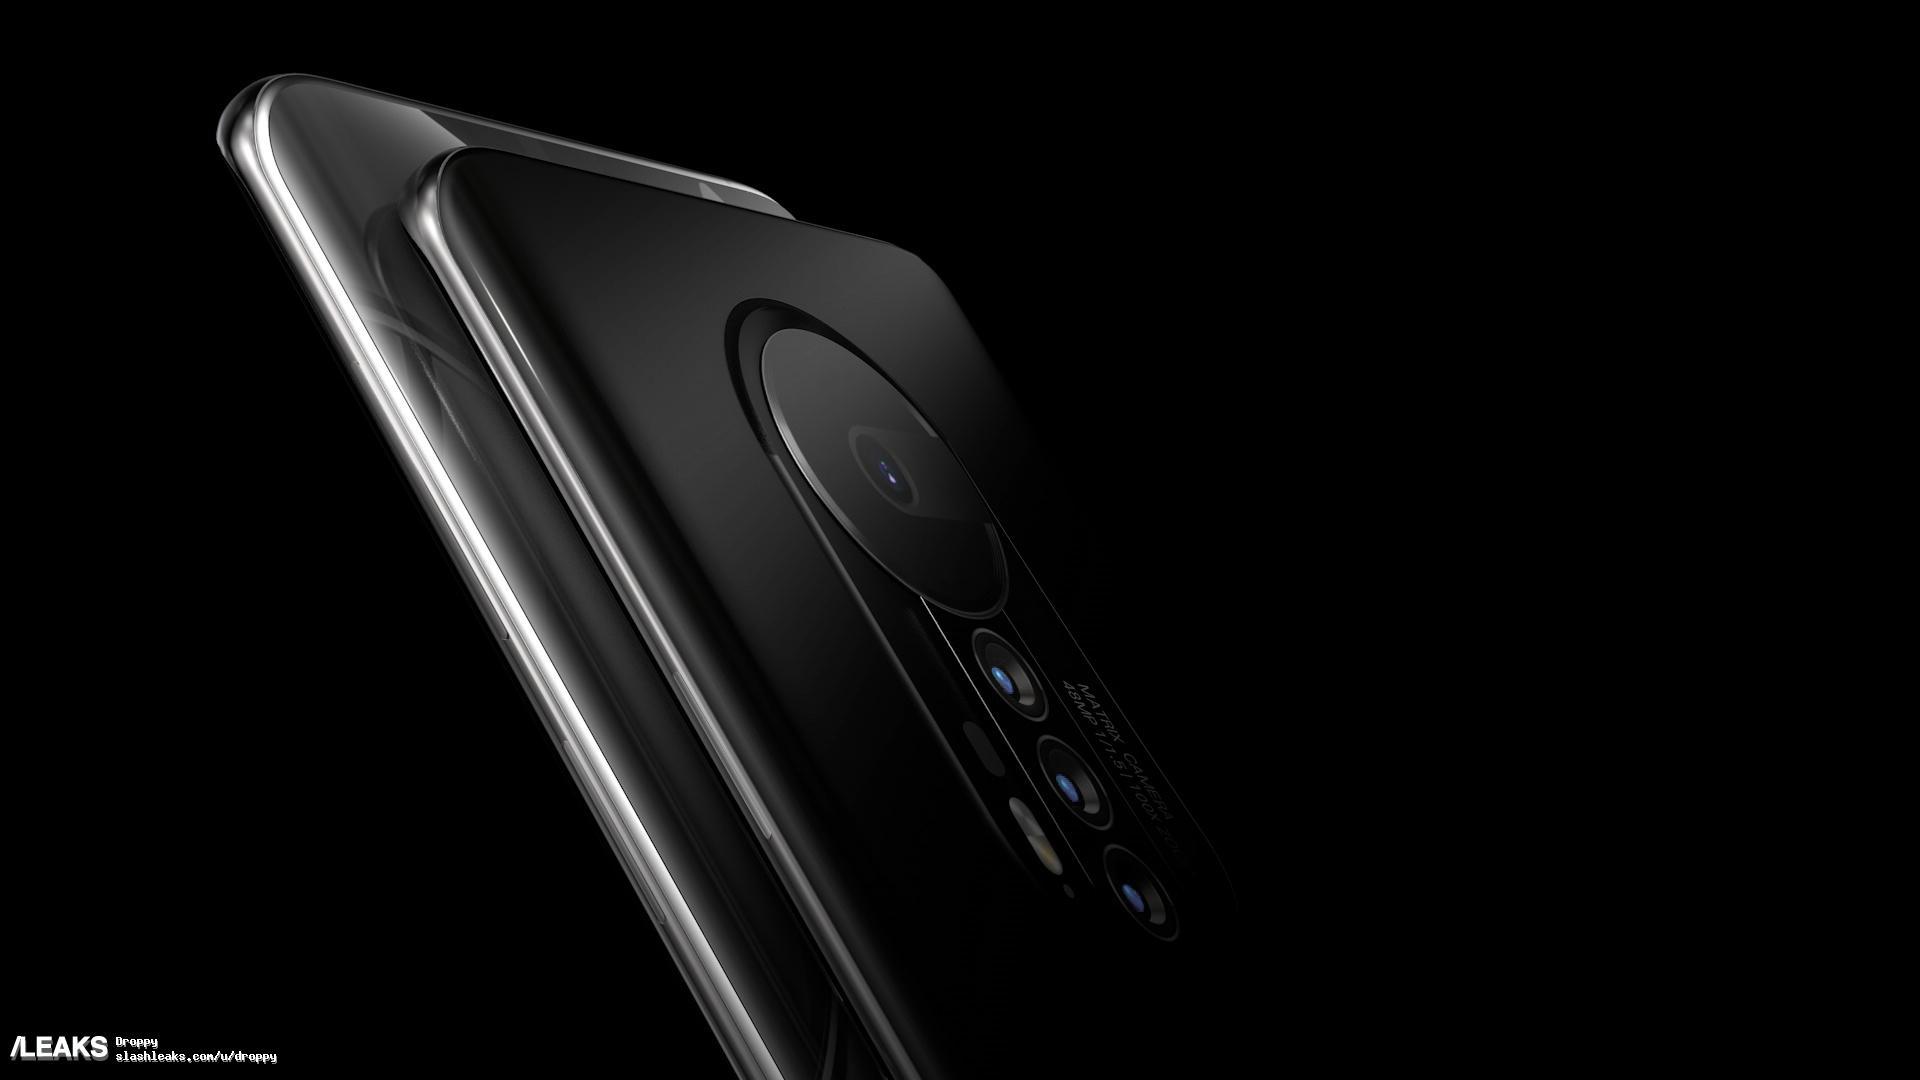 Honor Magic3 метит в лидеры AnTuTu, опередив по производительности Black Shark 4 Pro и Xiaomi Mi 11 Ultra в